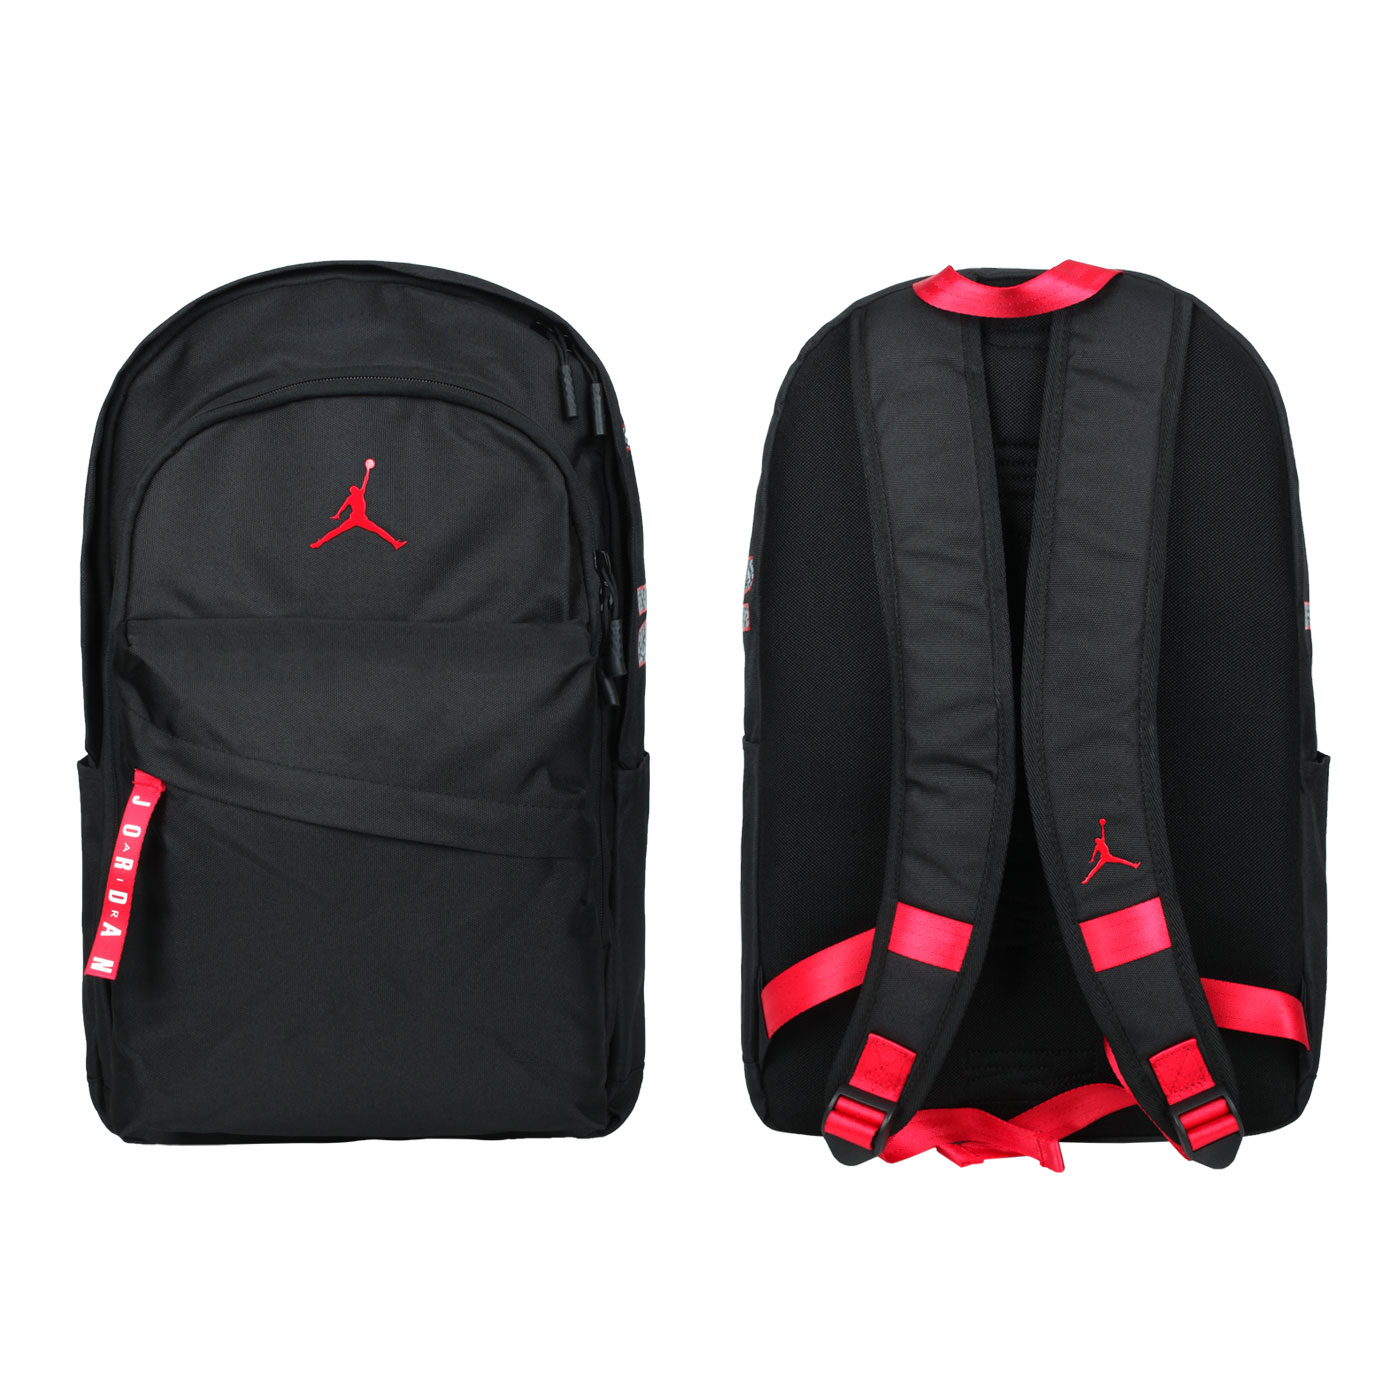 NIKE 大型雙肩包 JD2133032GS-001 - 黑紅